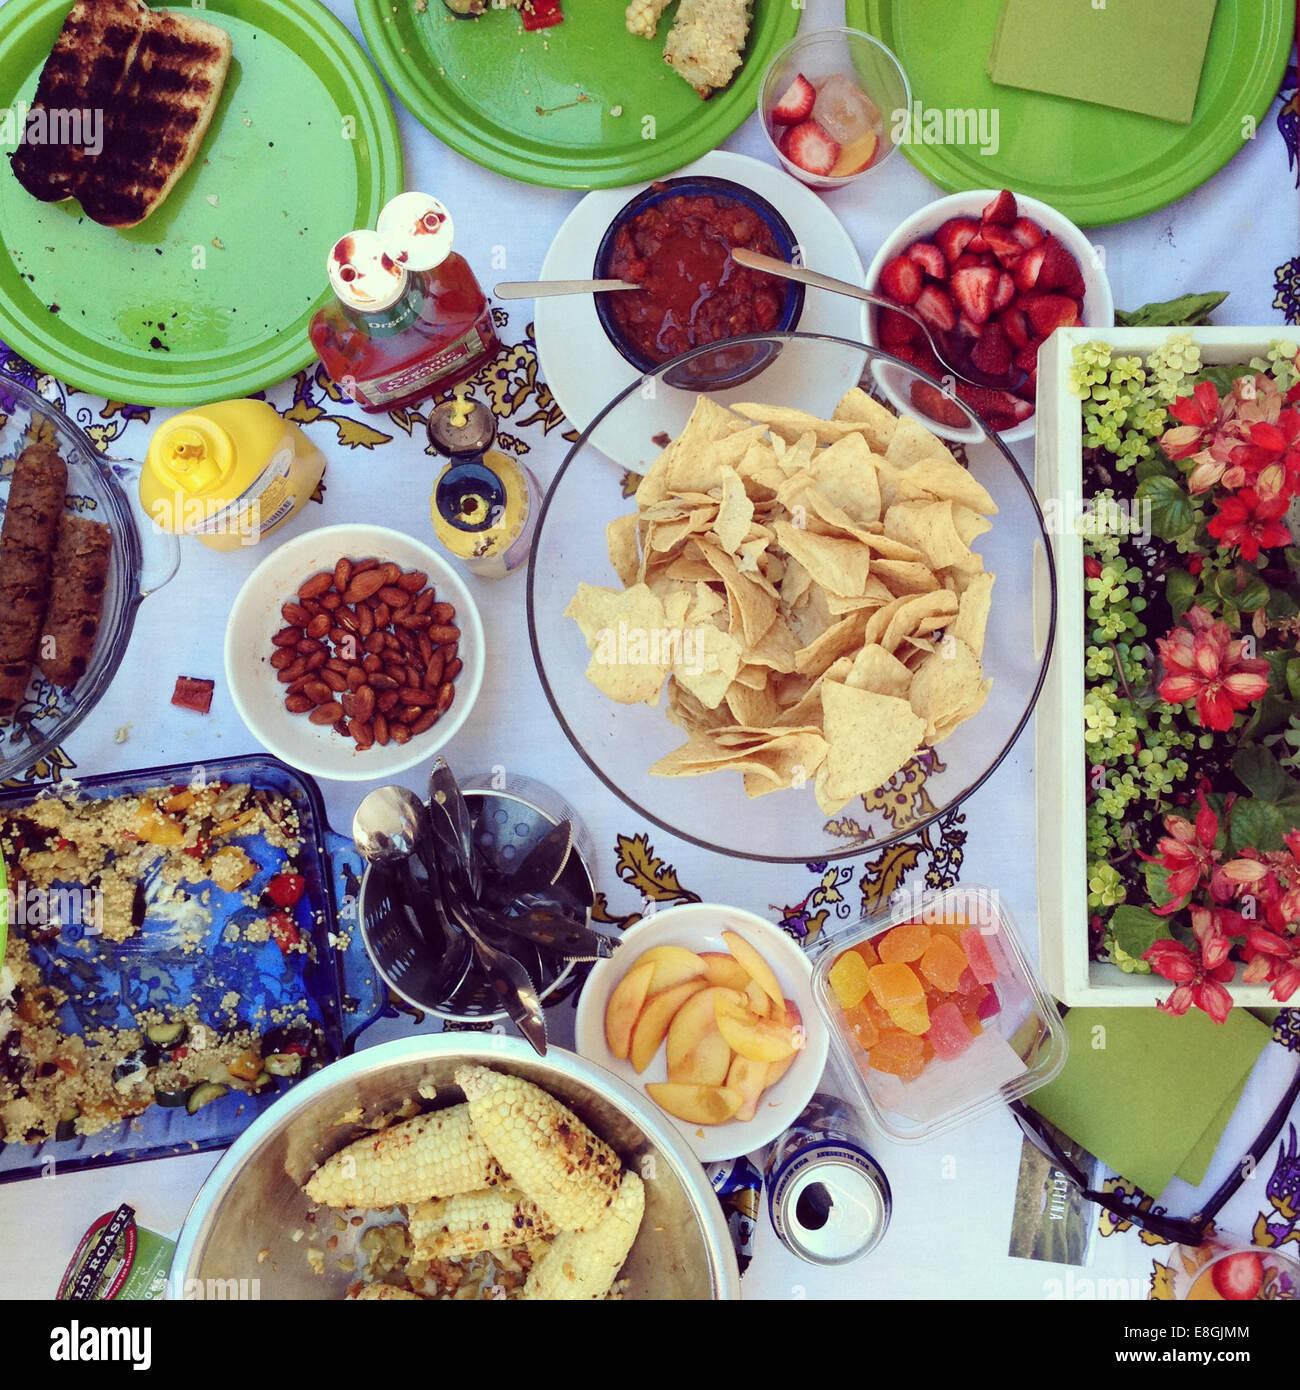 Tabelle mit gegrillte Speisen Stockbild